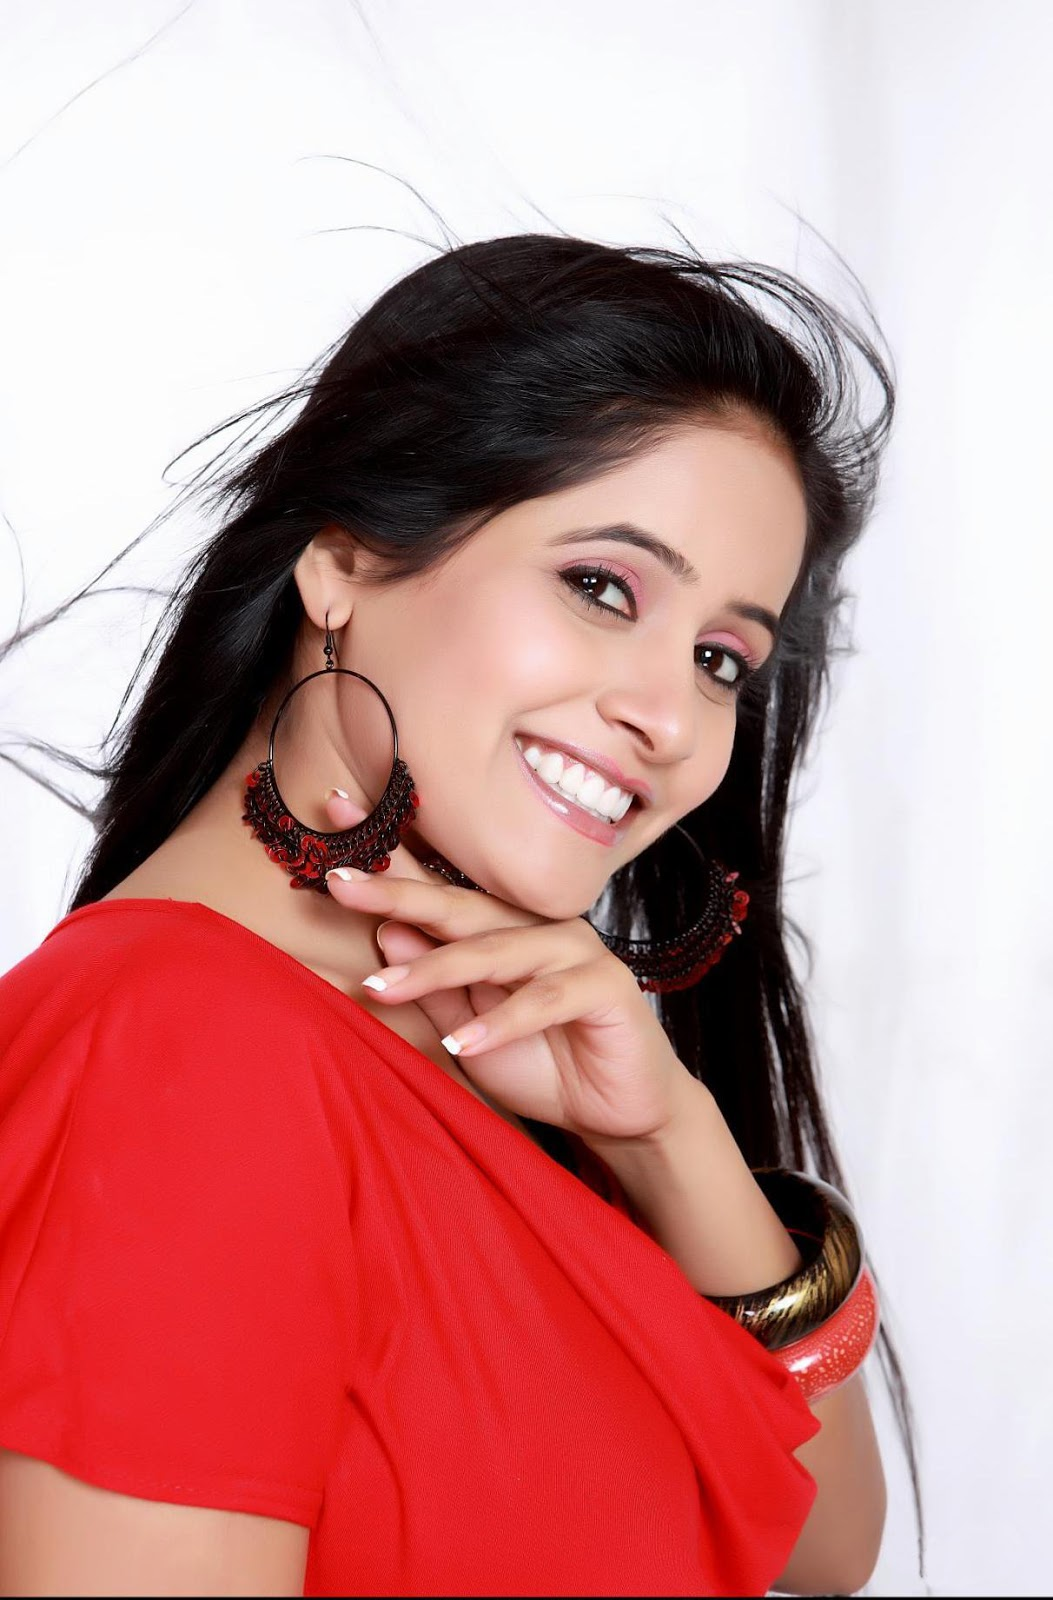 Miss Poojas Unseen Photos - Sabwoodcom-2707